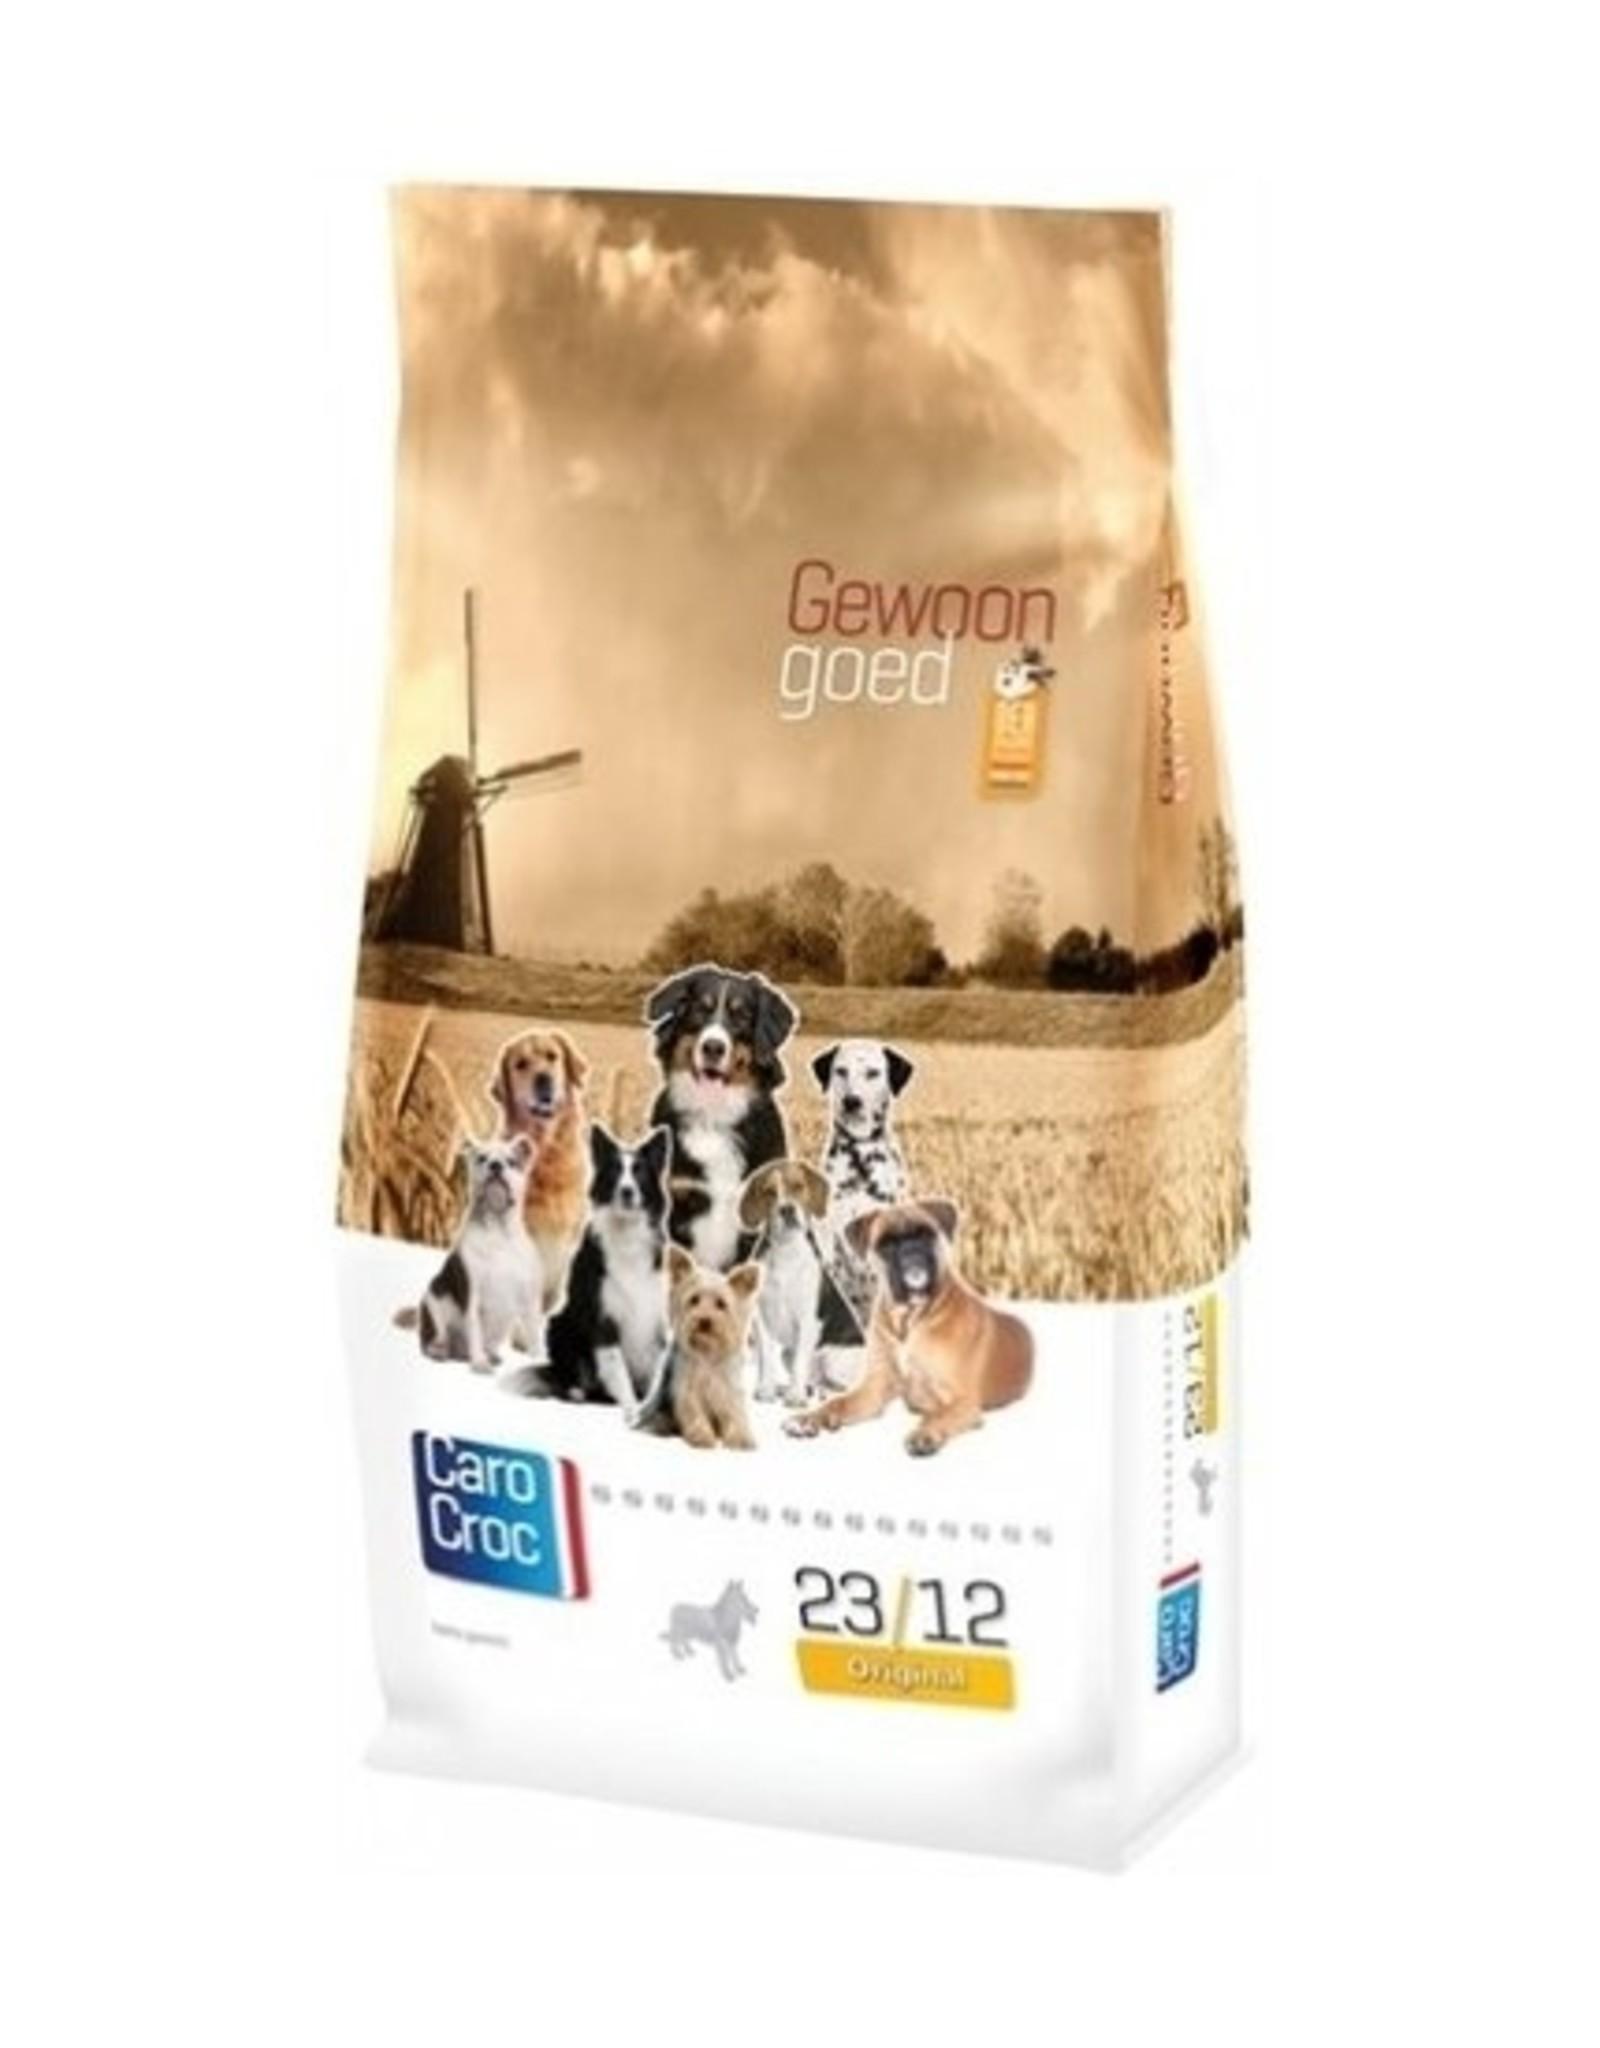 Sanimed Sanimed Carocroc 23/12 Hond Chk Rice 15kg